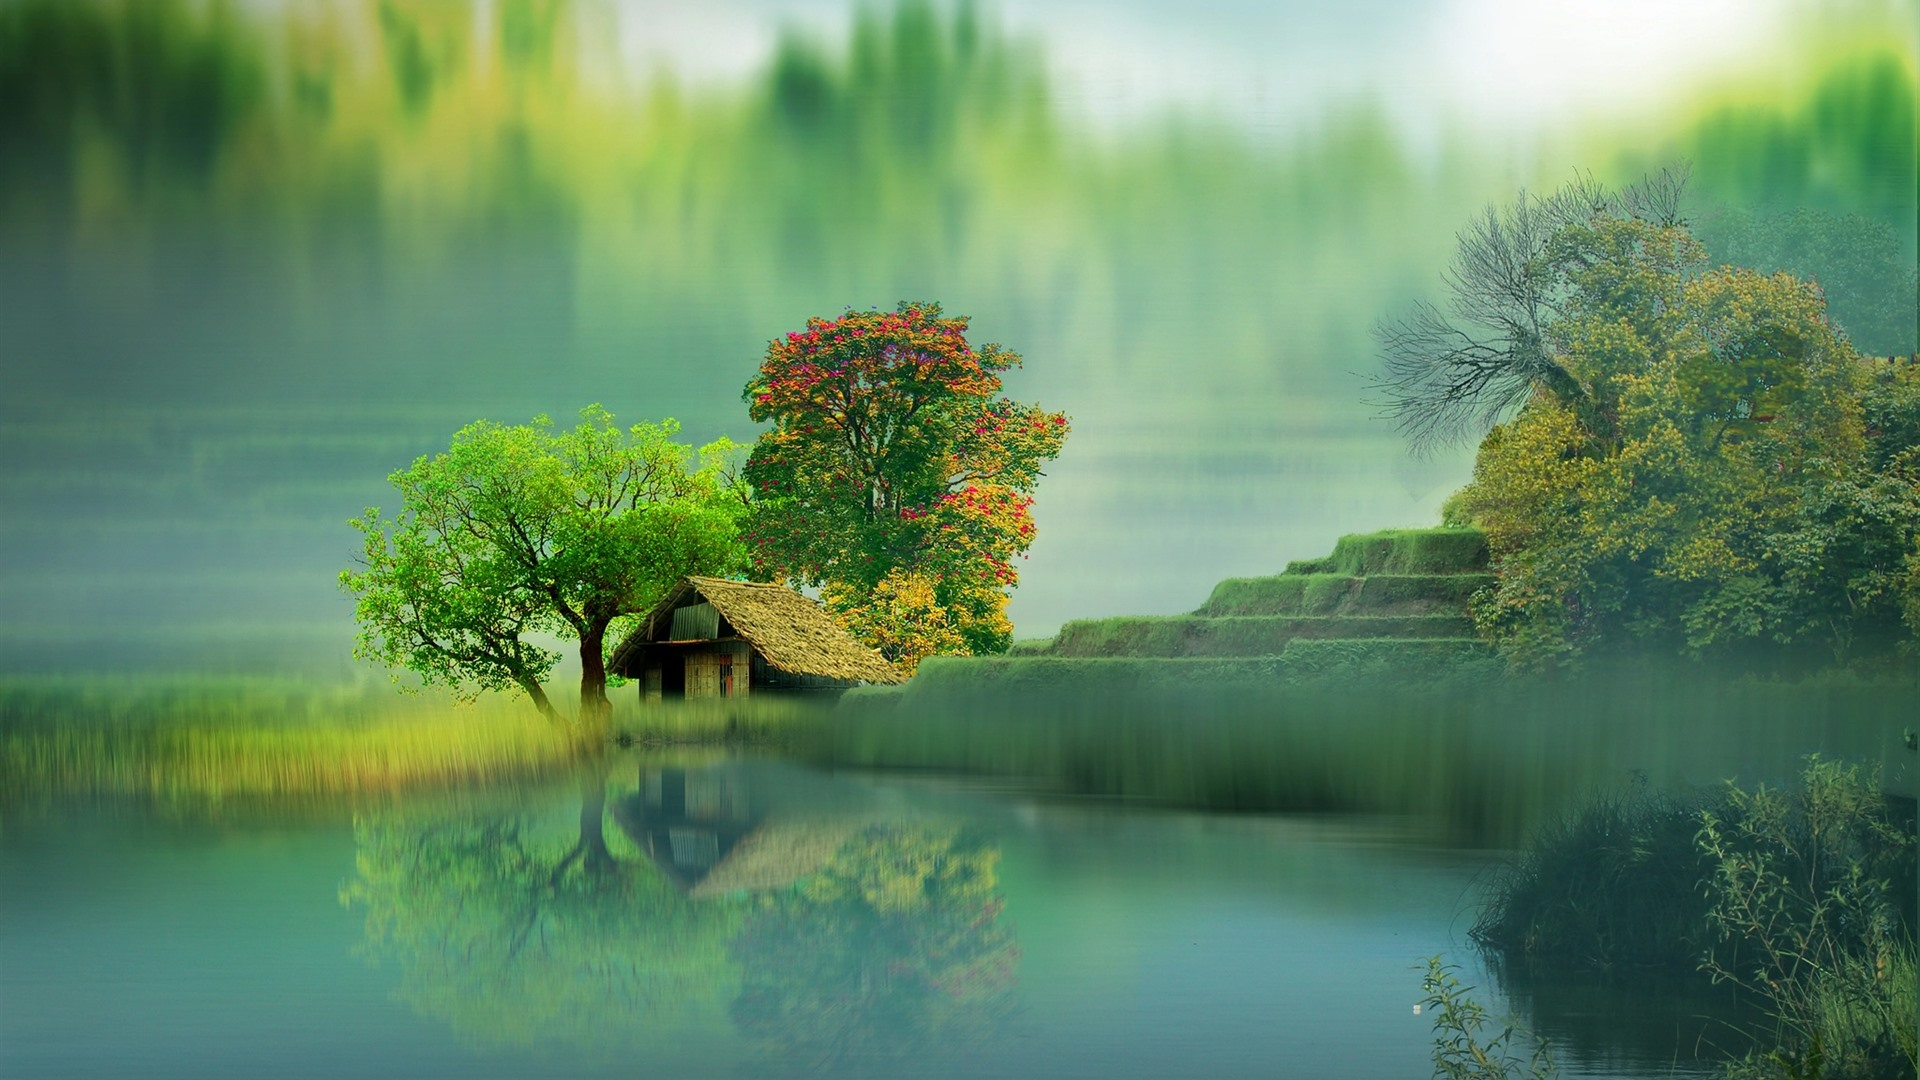 Beautiful Scenery House Lake Trees Fog Water Reflection